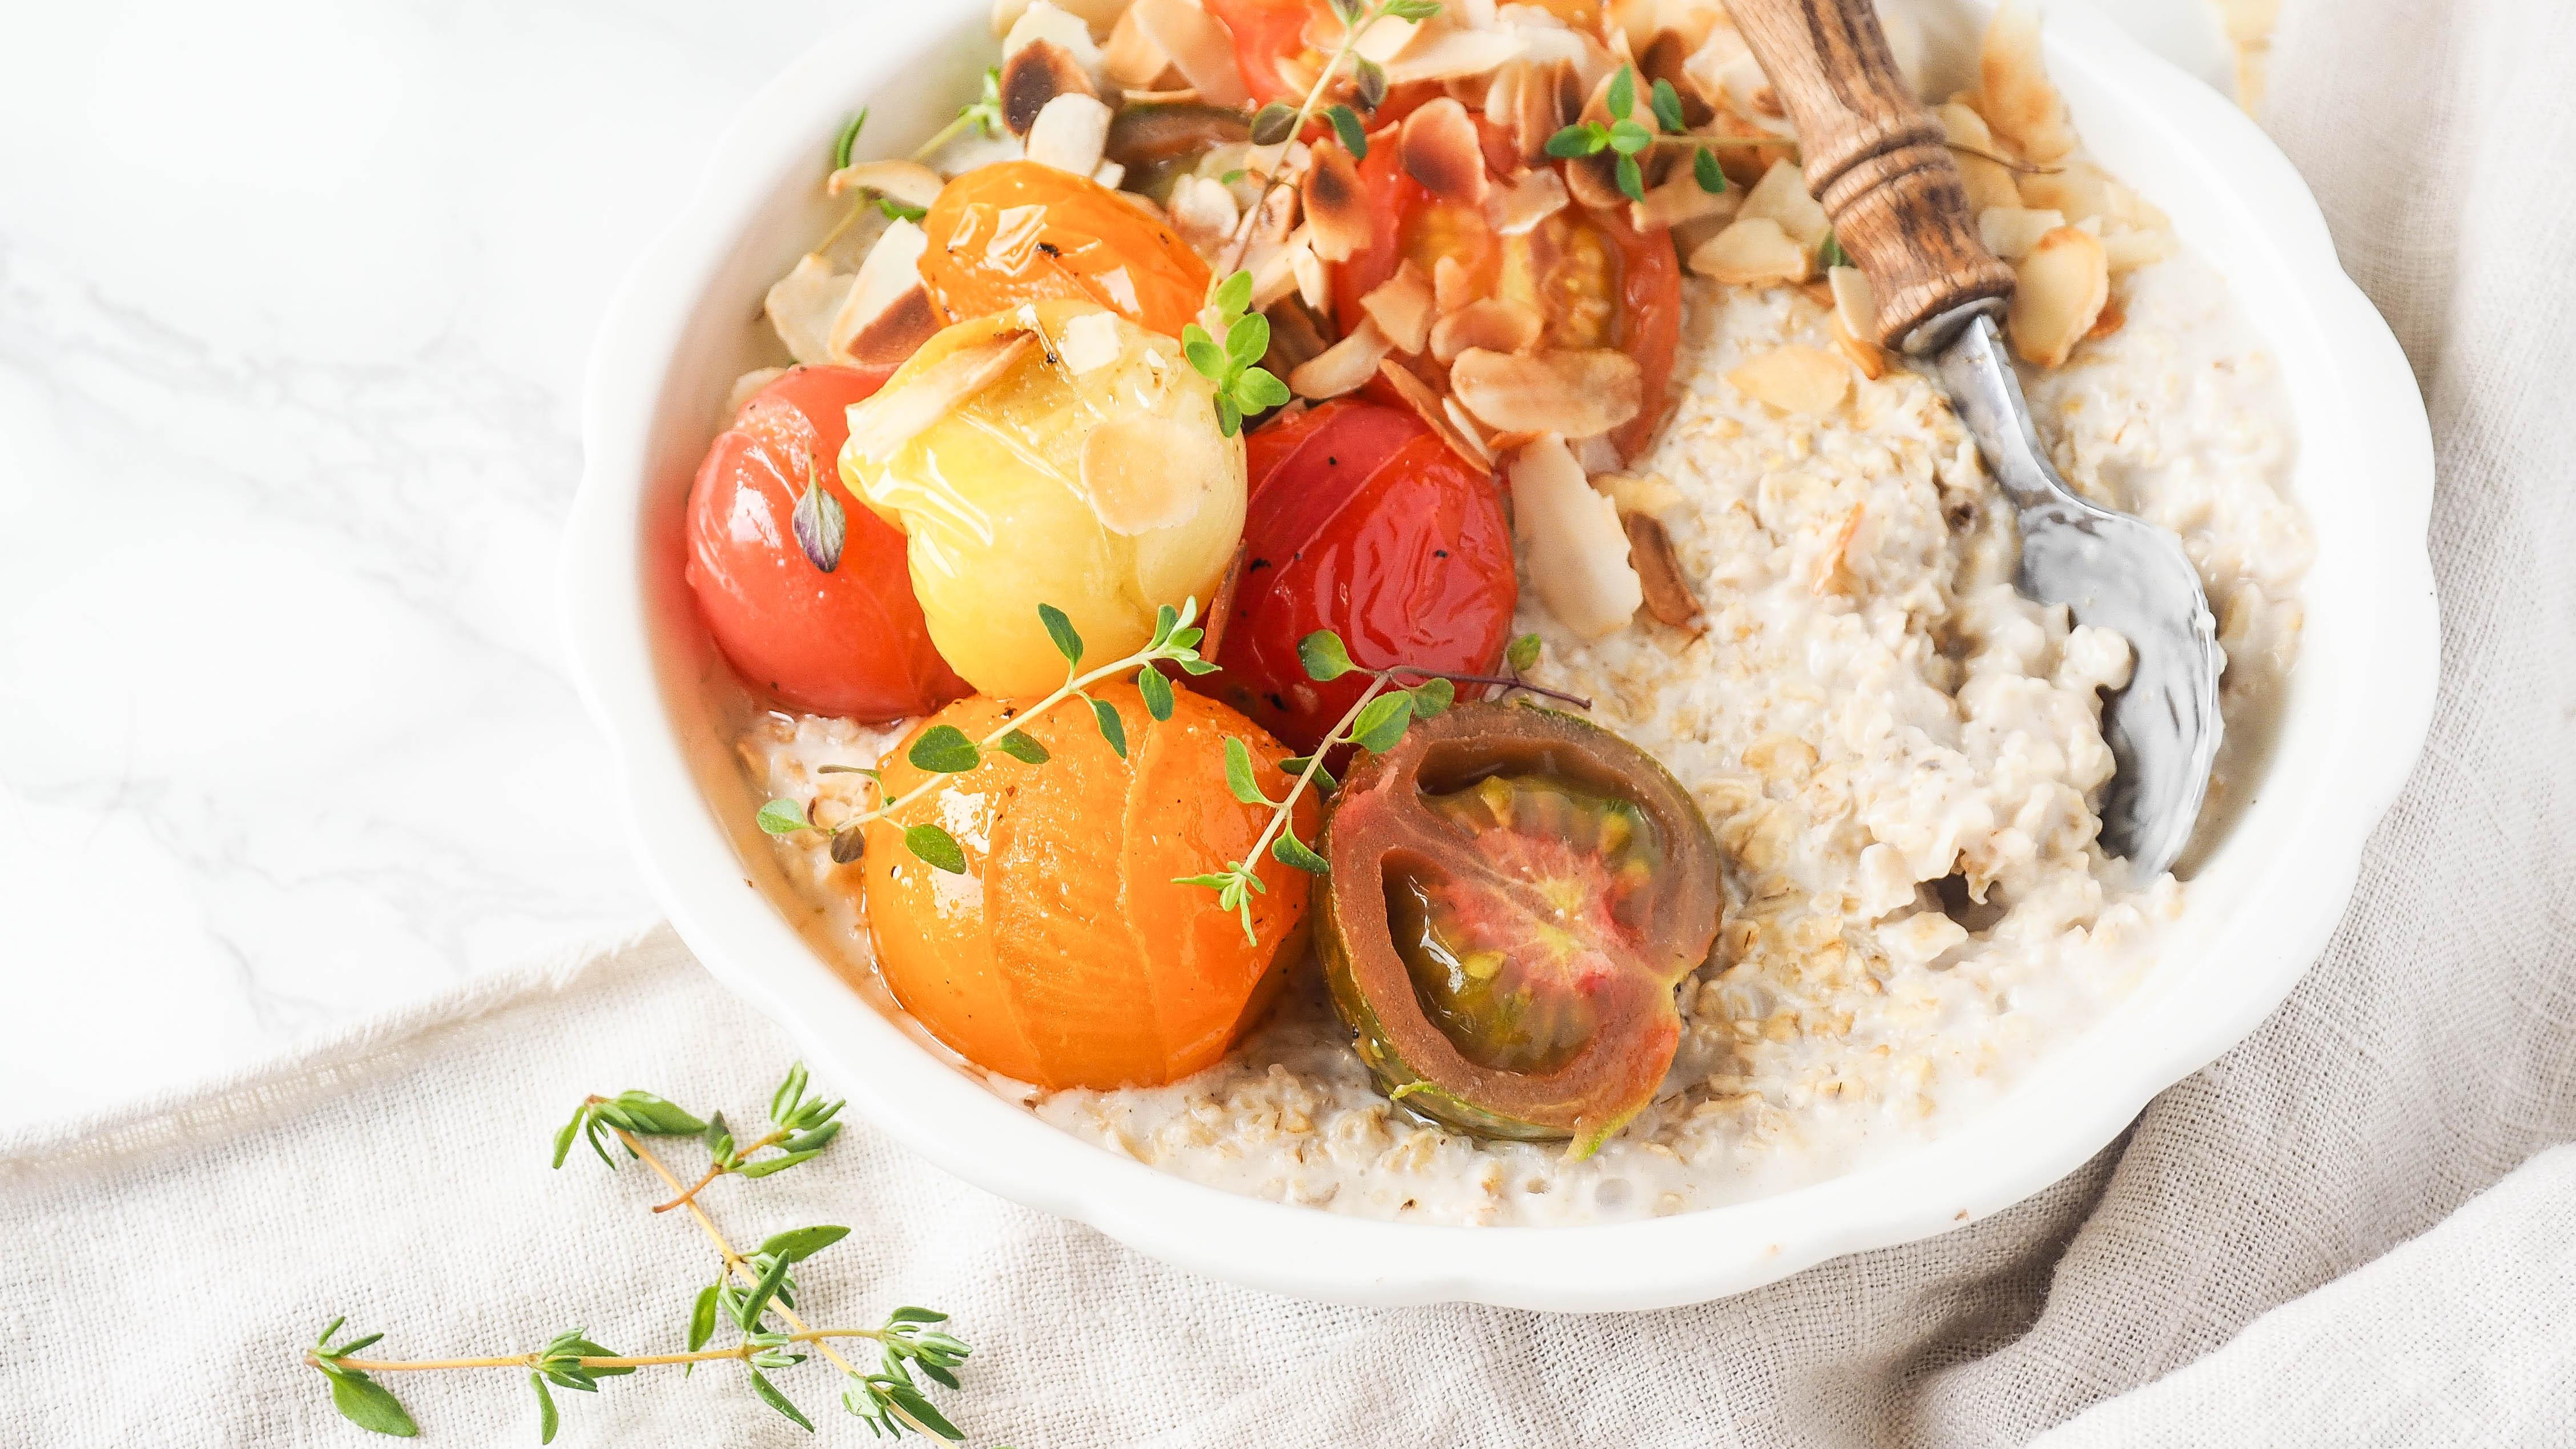 5x LKKRDR: Honing-amandel havermout met geroosterde tomaten